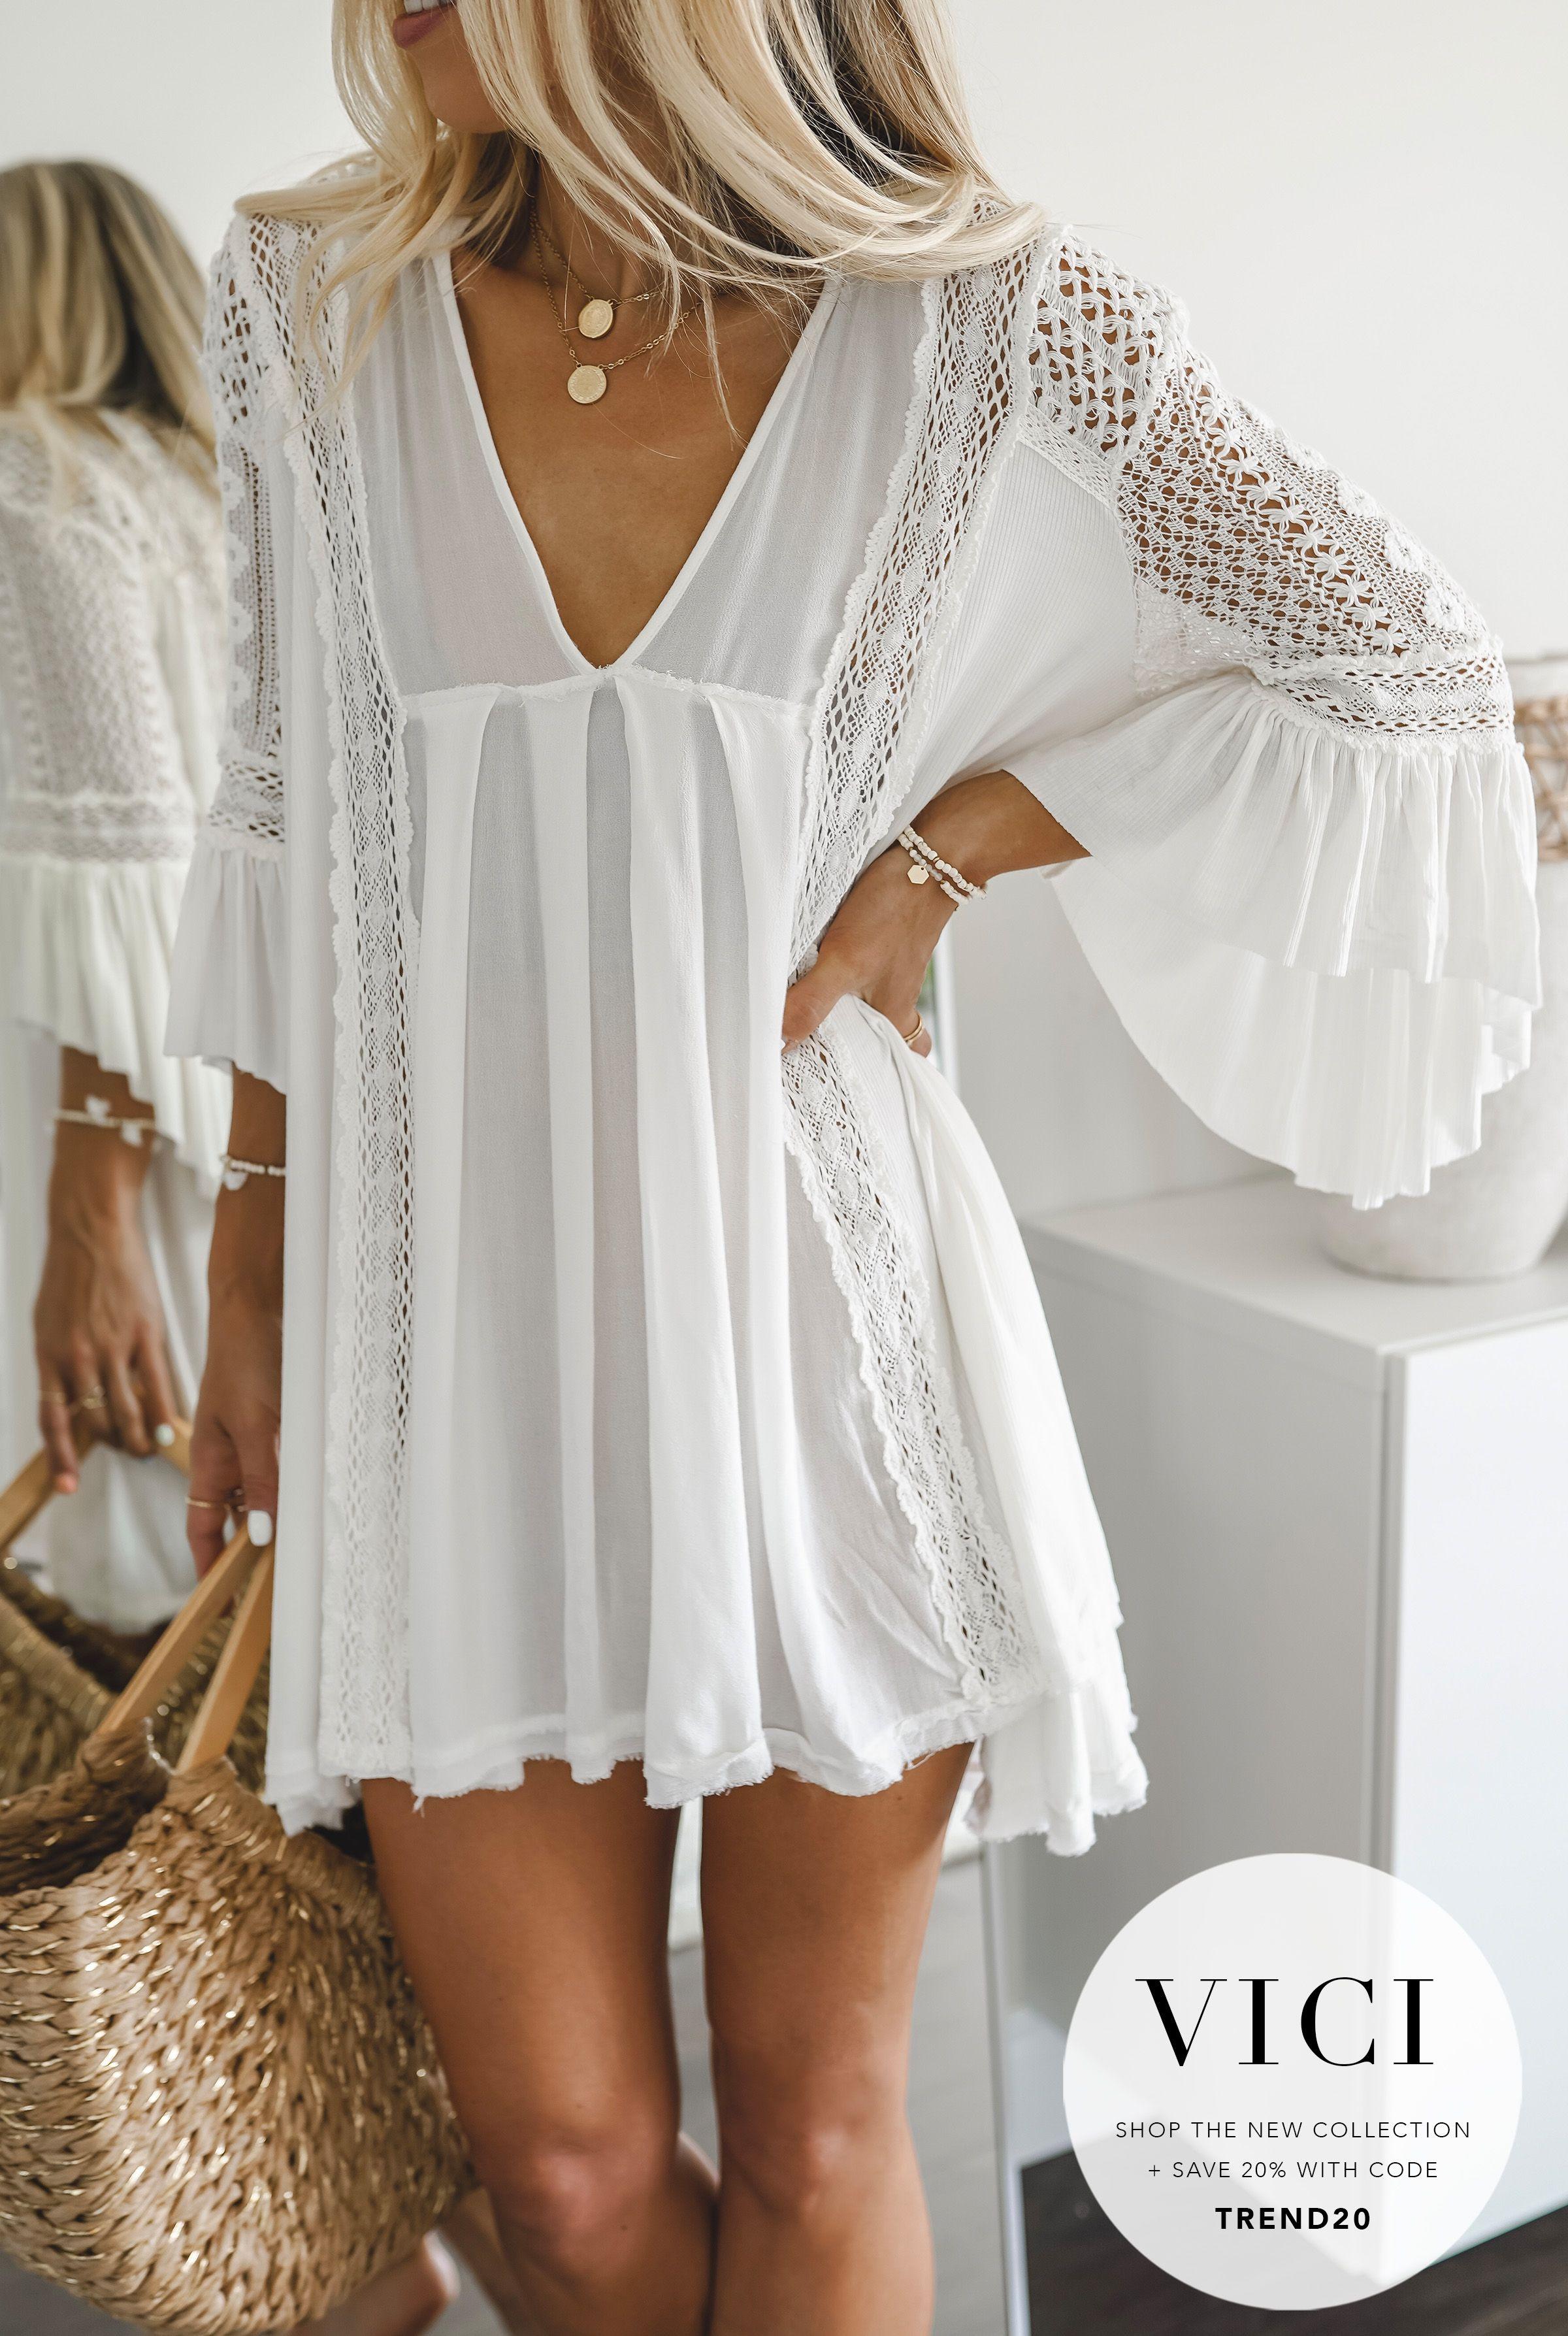 Vici Ericashaw Fashion Outfits Fashion Dresses [ 3575 x 2400 Pixel ]